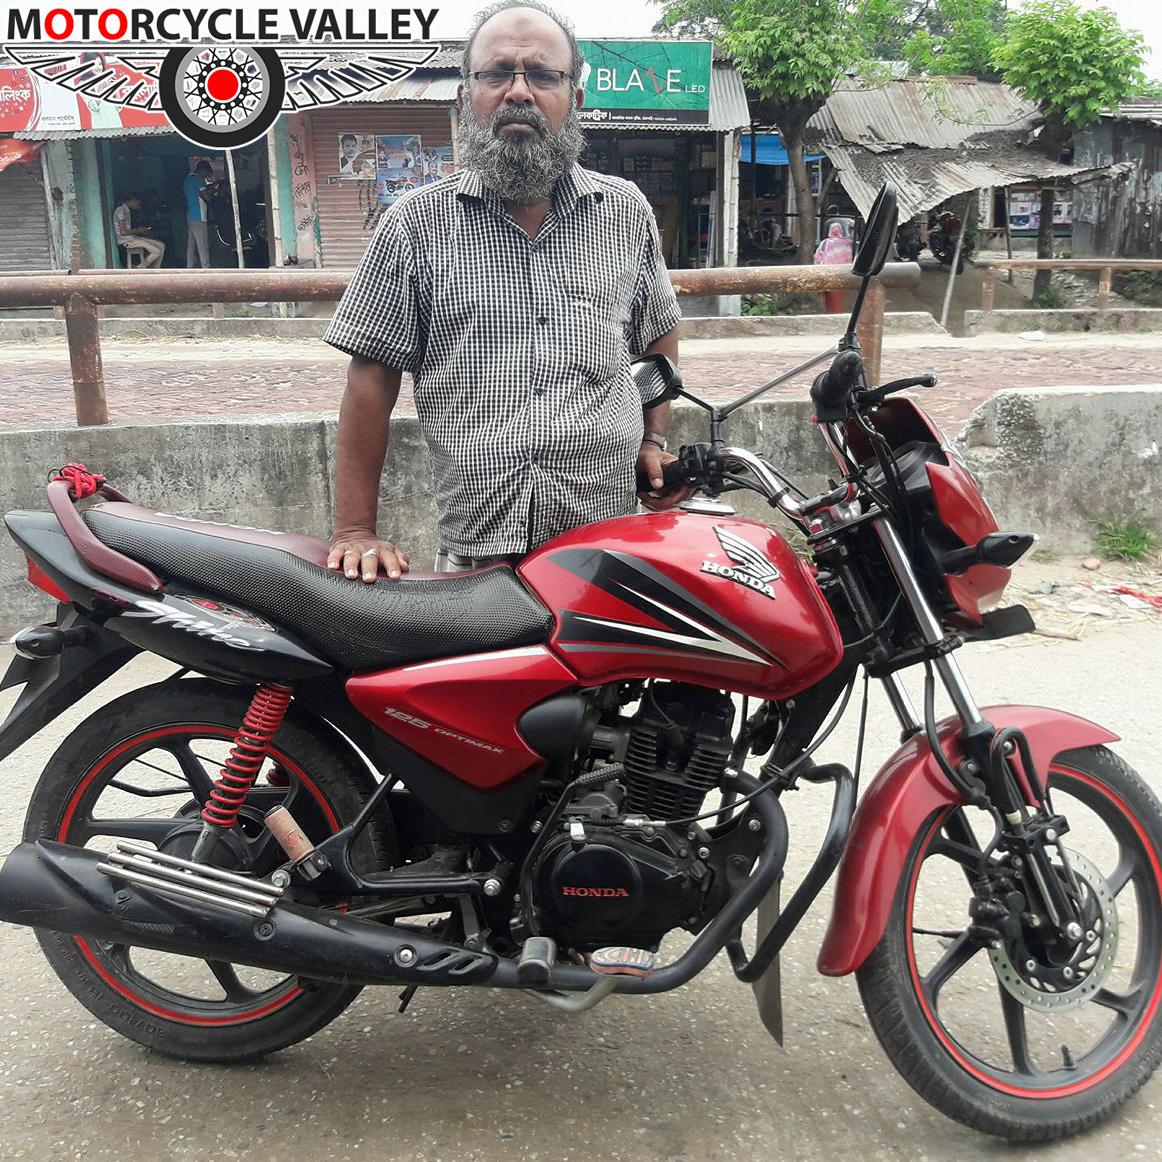 Honda Cb Shine 125 User Review By Muntaj Ali Motorbike Review